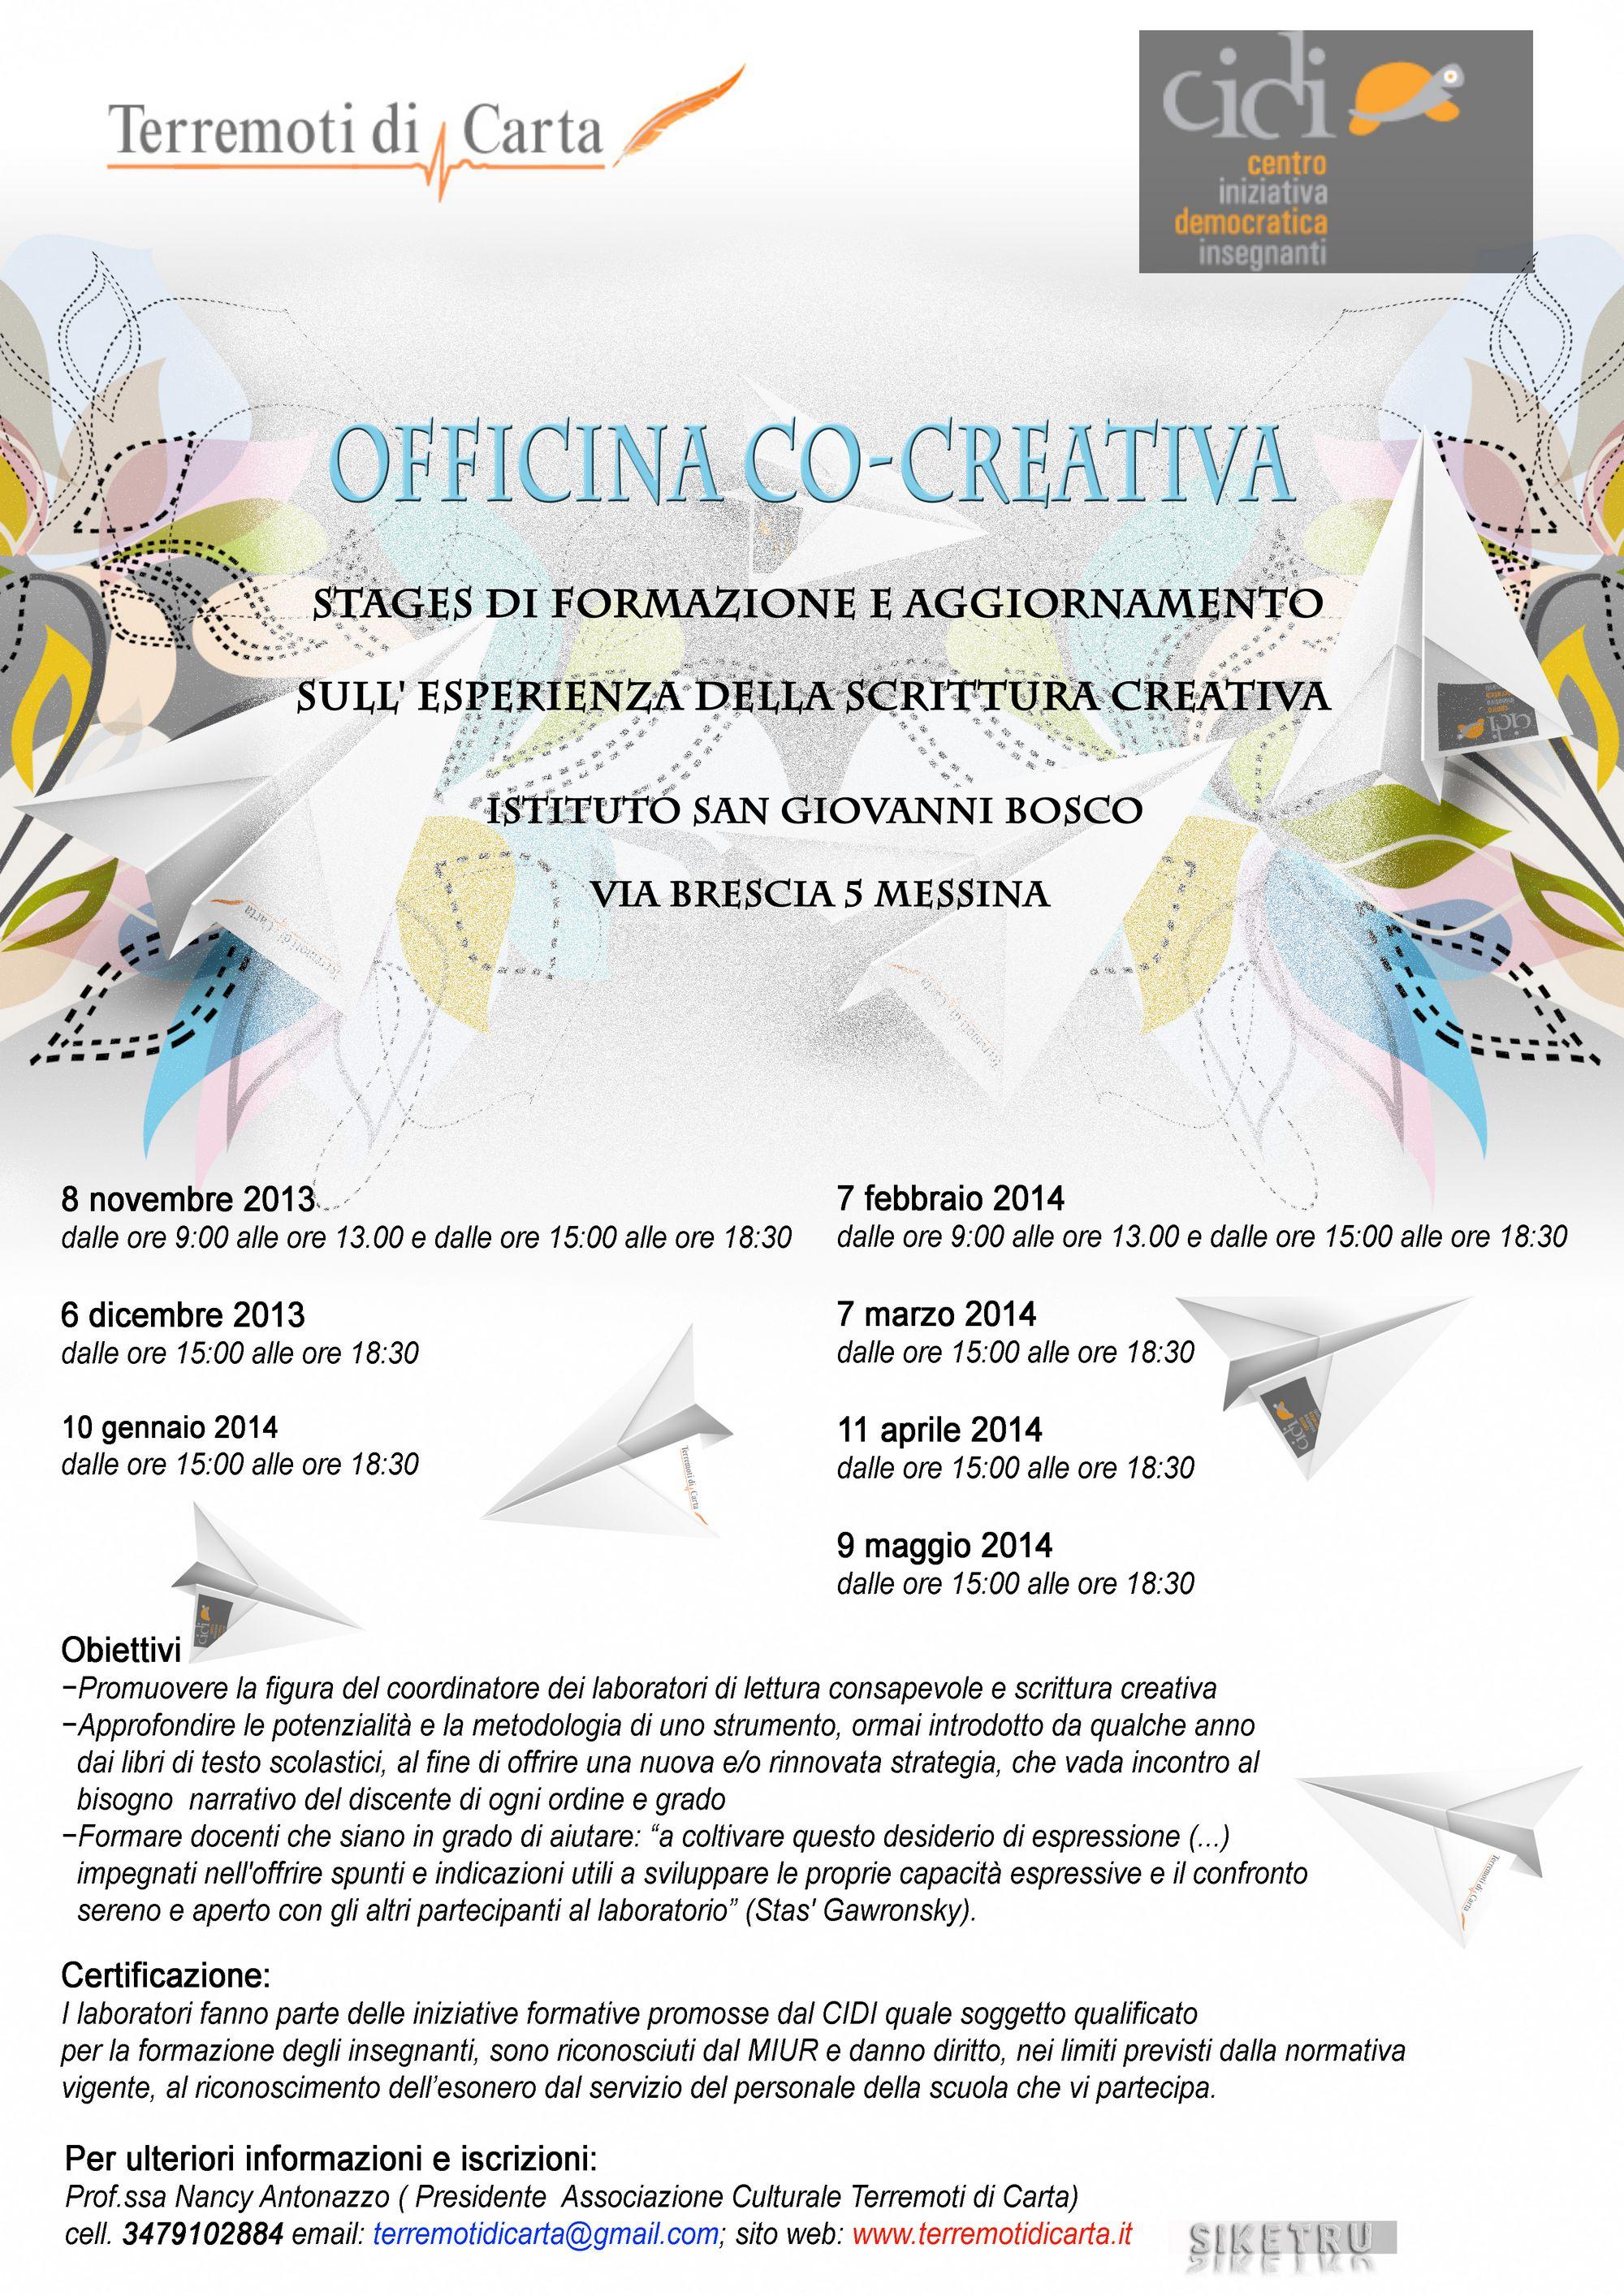 tn locandina officina co-creativa